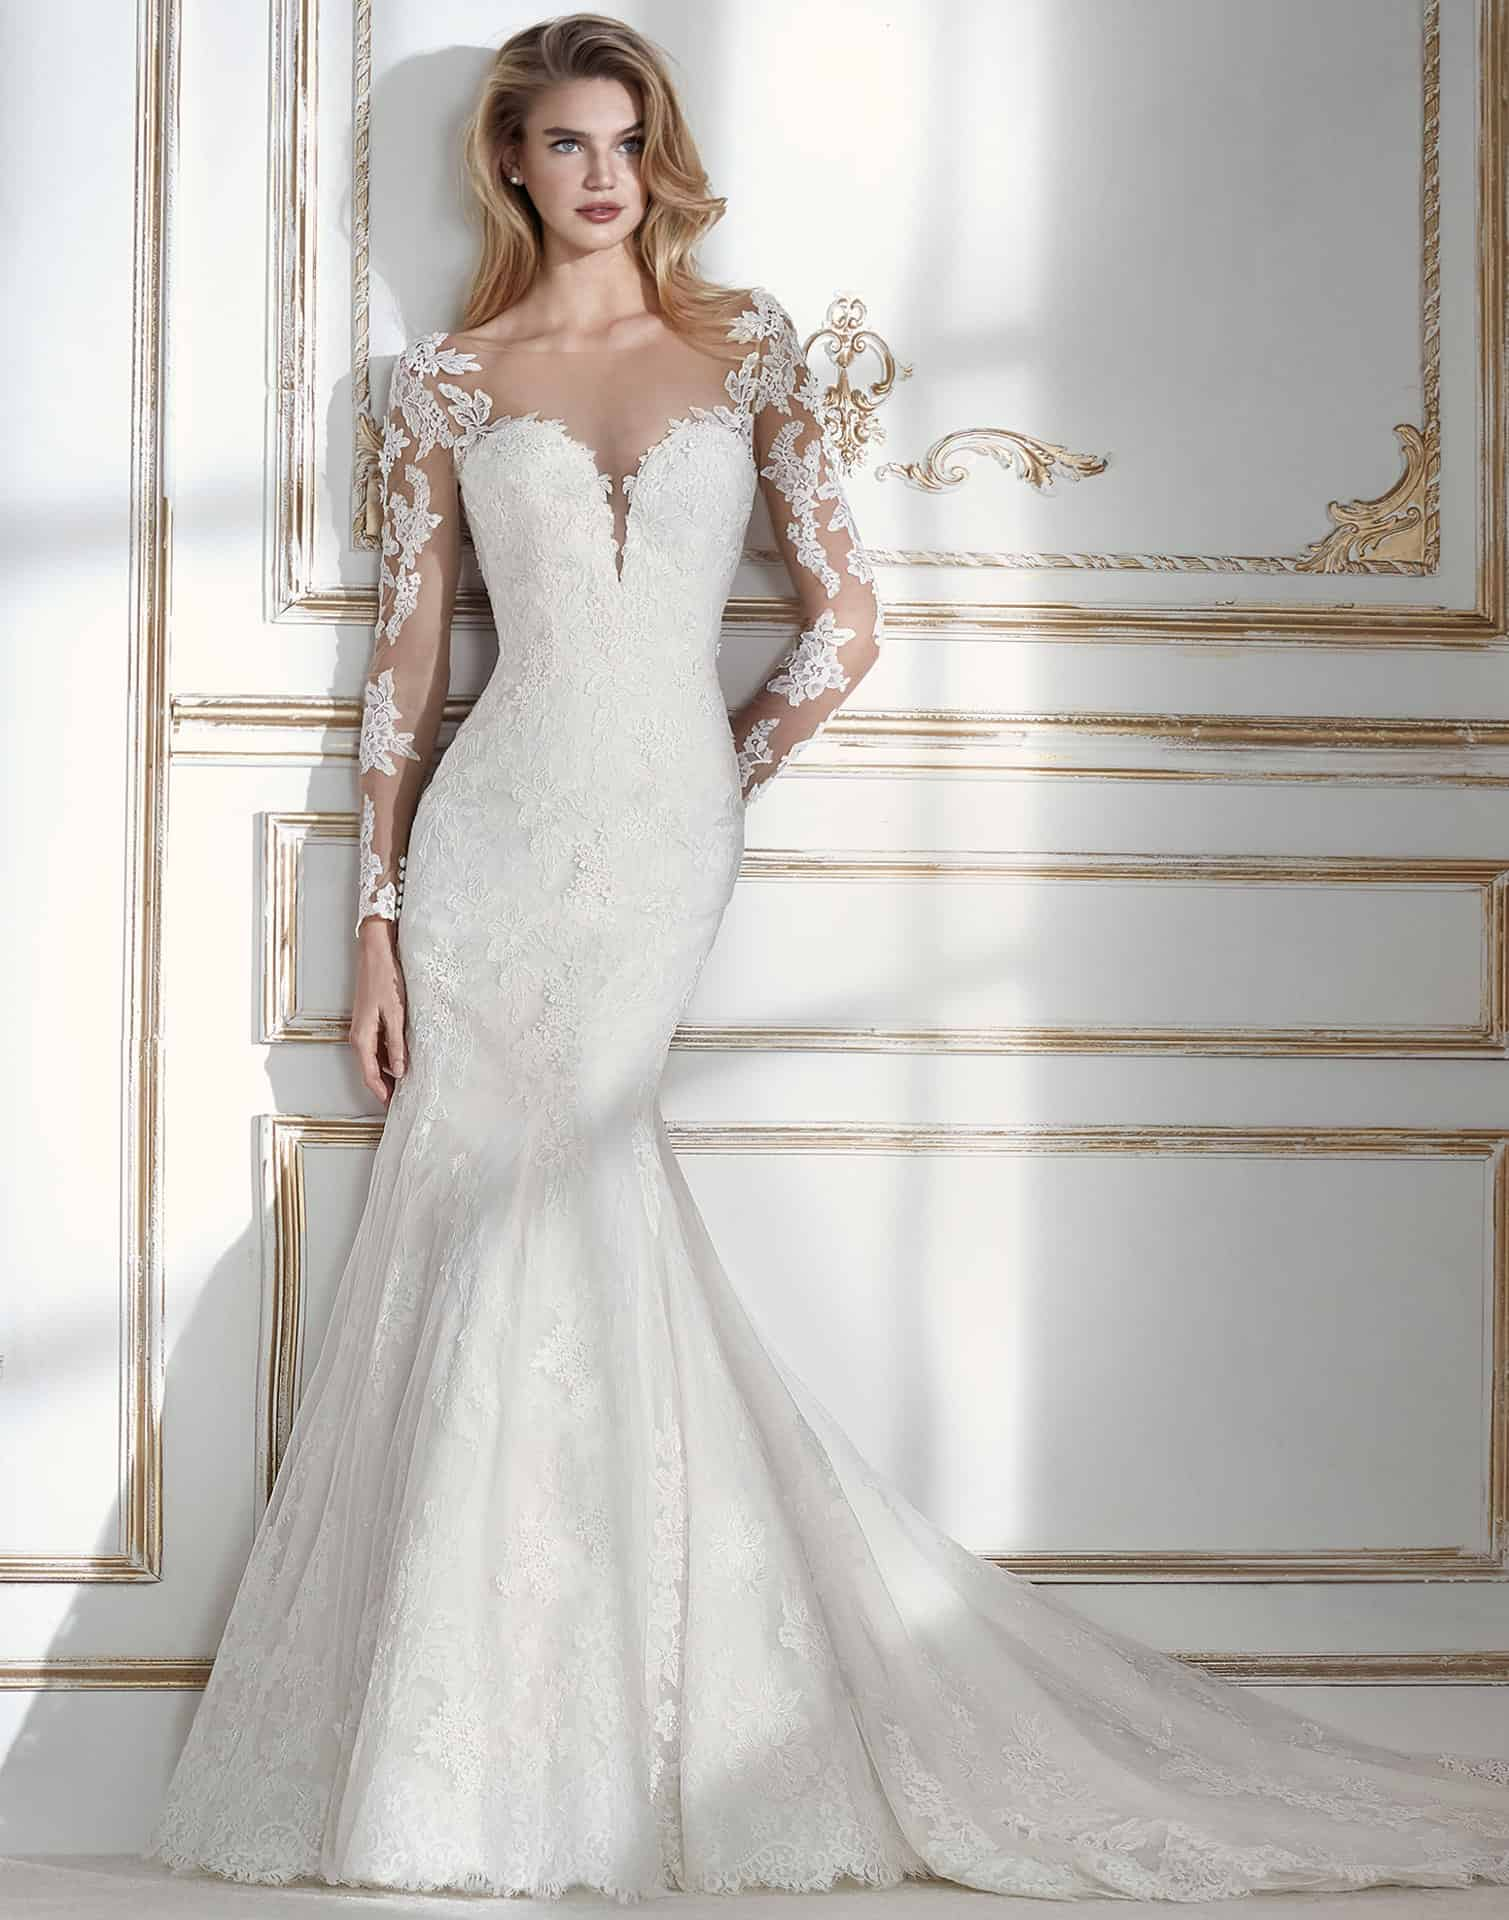 Wedding Dresses Gallery 47